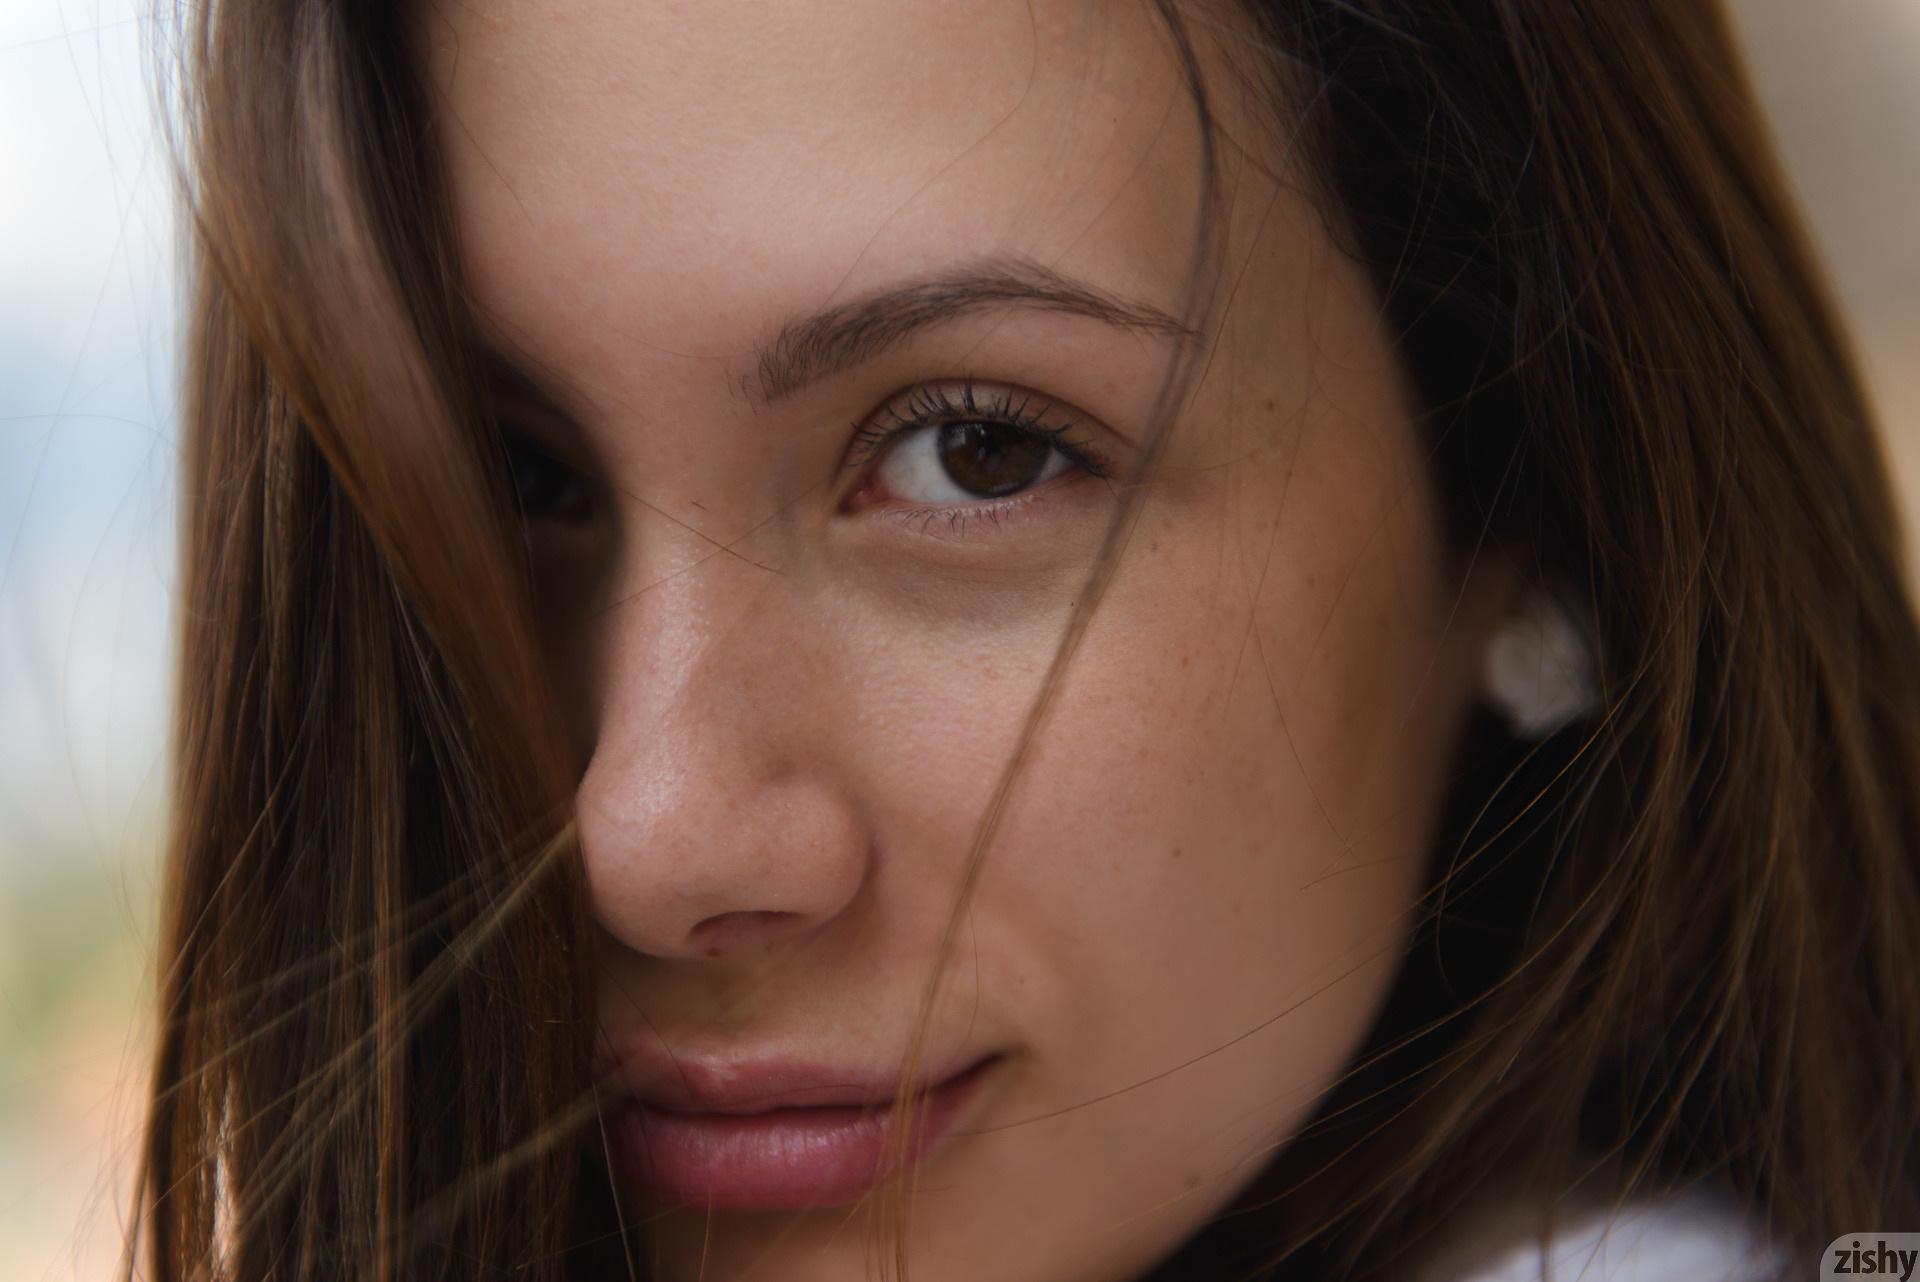 Paloma Andaquies Flores Colombianas Zishy (21)